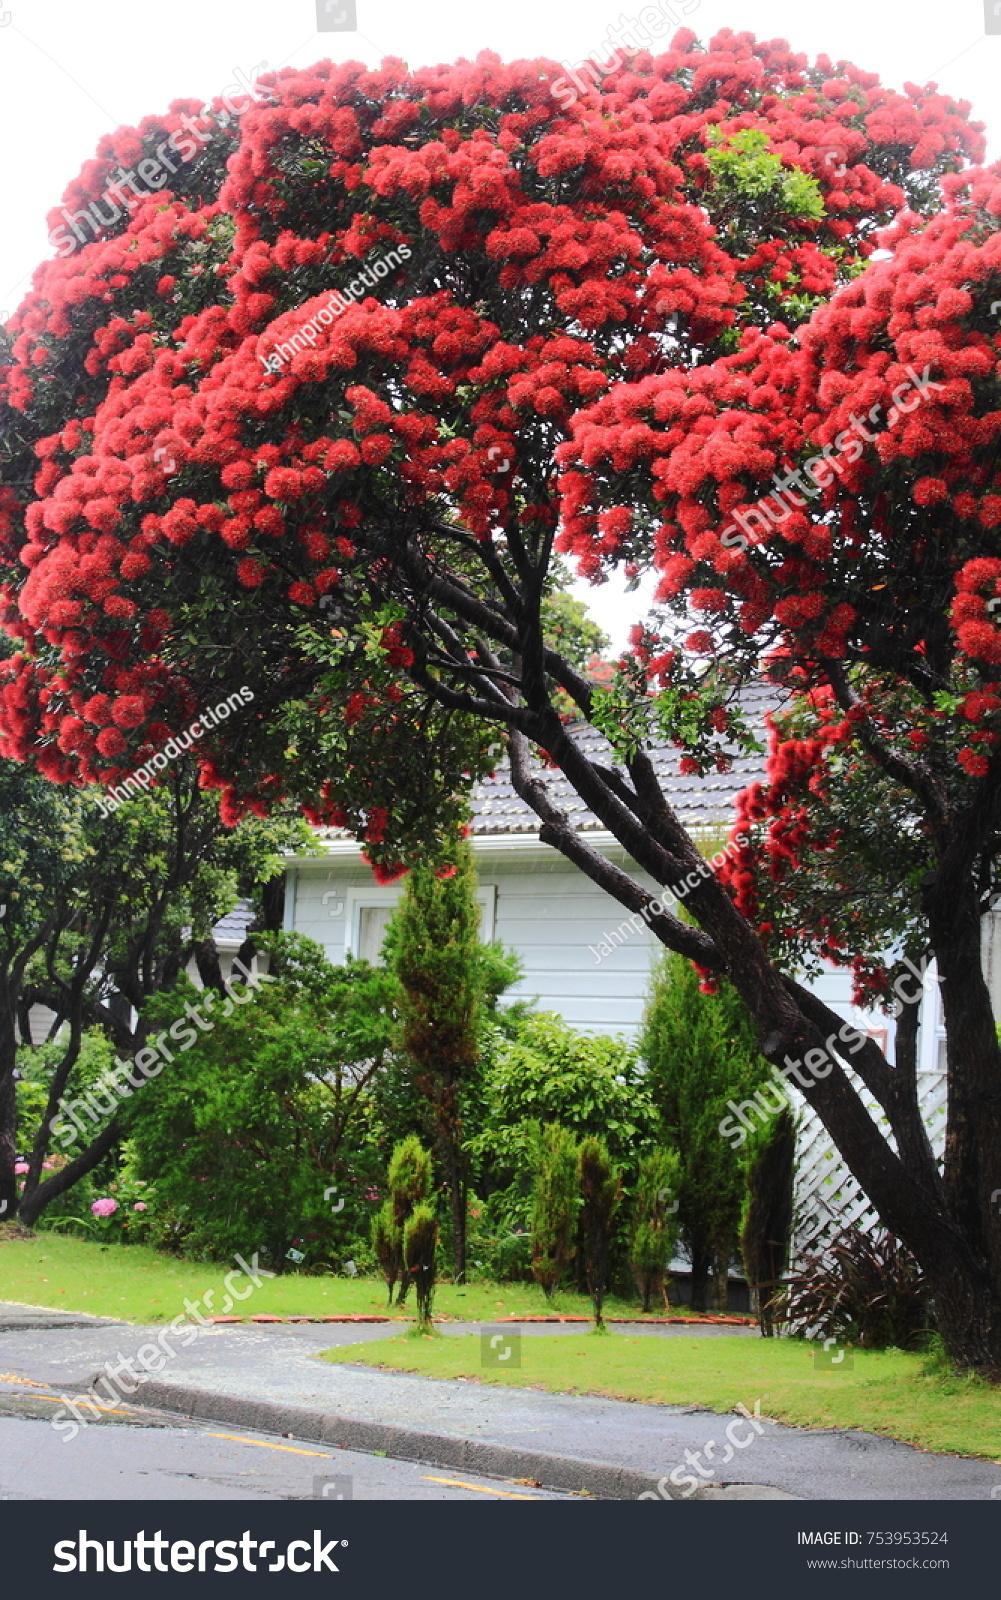 Pohutukawa New Zealand Christmas Tree Stock Photo Edit Now